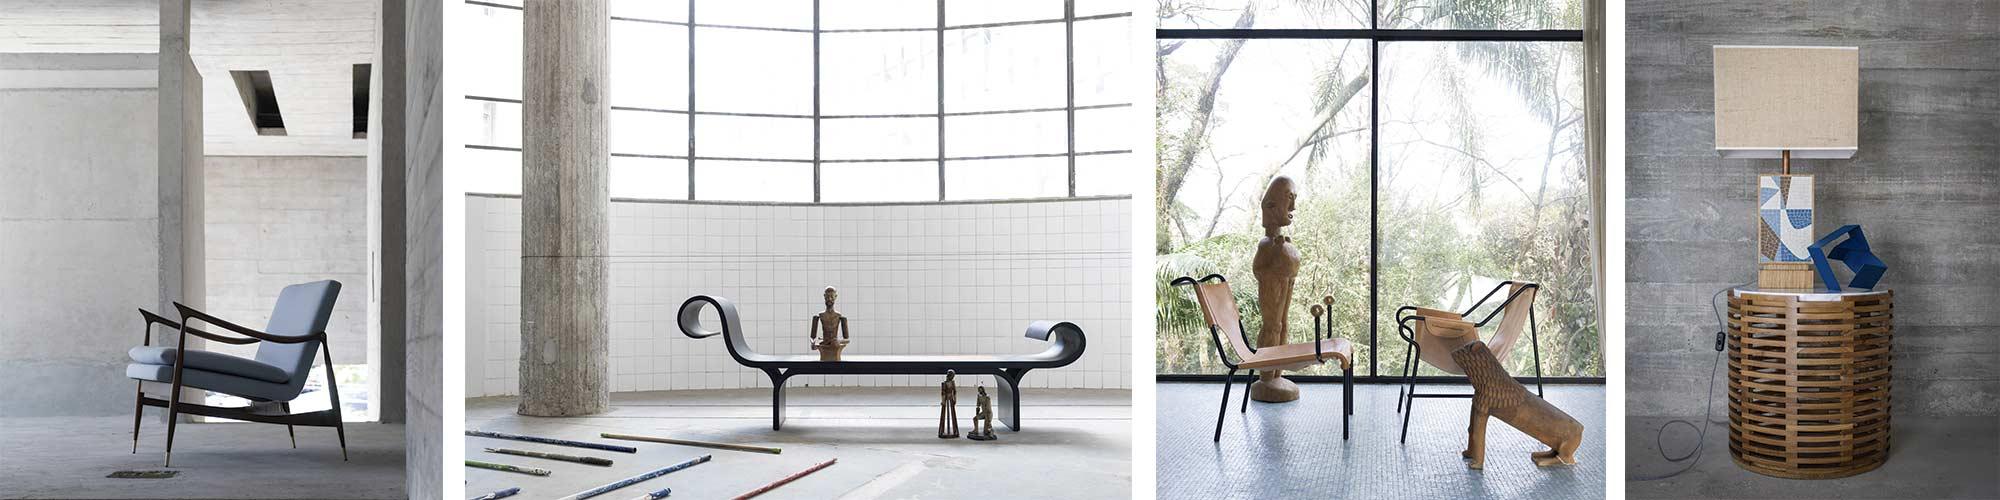 Mestres Modernos Brasileiros na Semana de Design. Obras de Jorge Zalszupin, Lina Bo Bardi, Oscar Niemeyer e Paulo Werneck